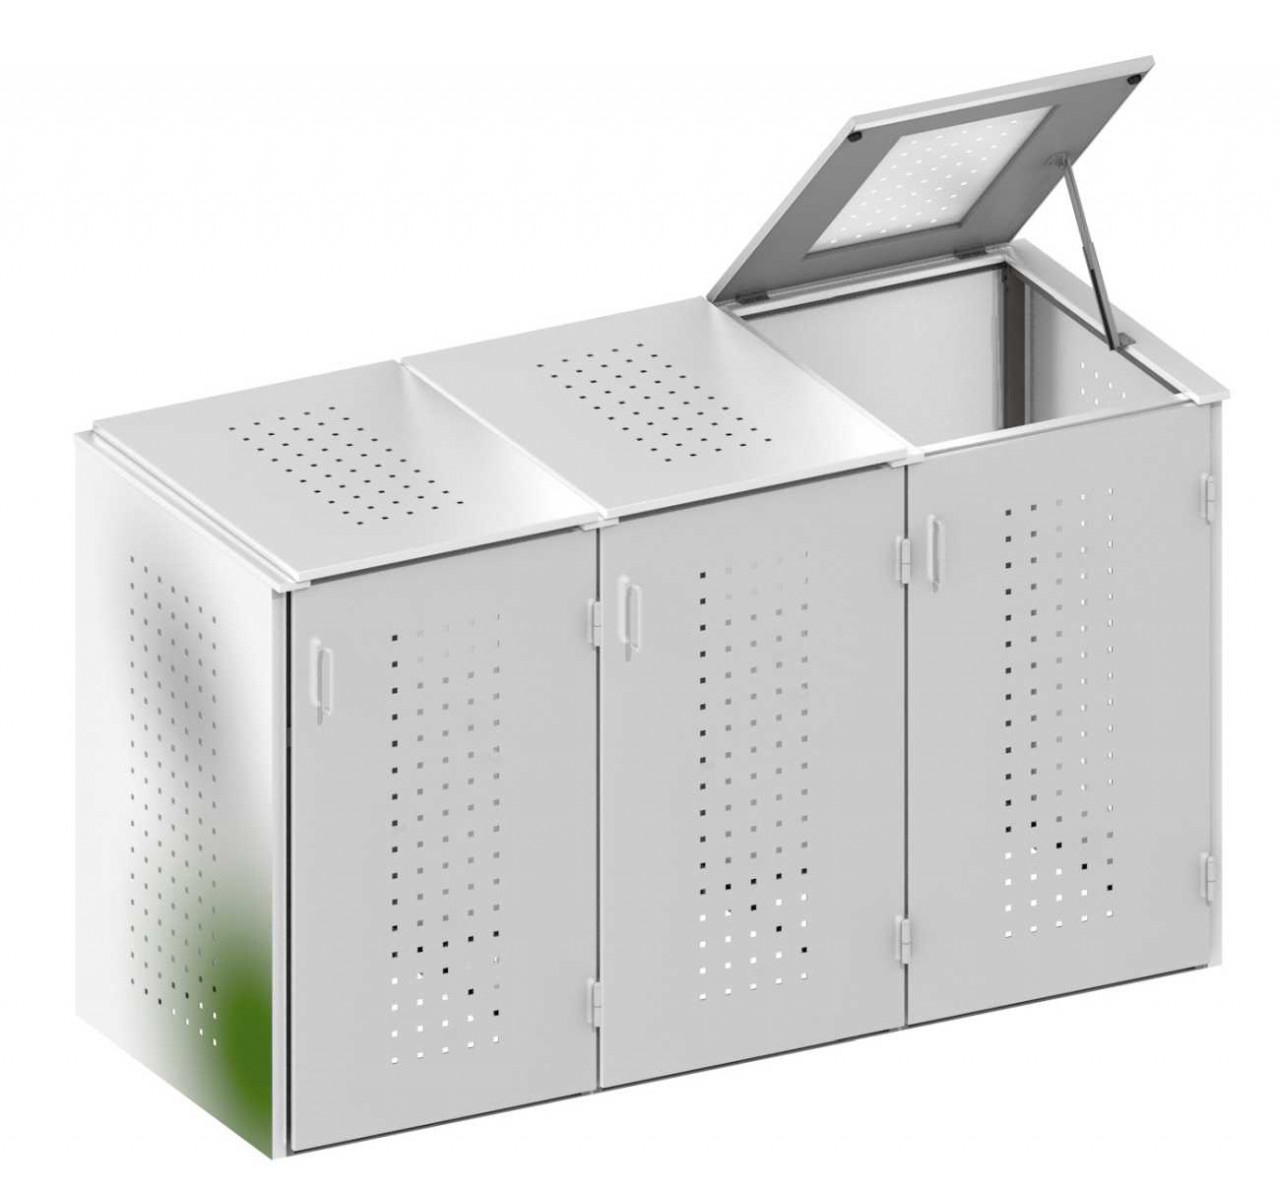 Müllbox Binto Edelstahl 3er